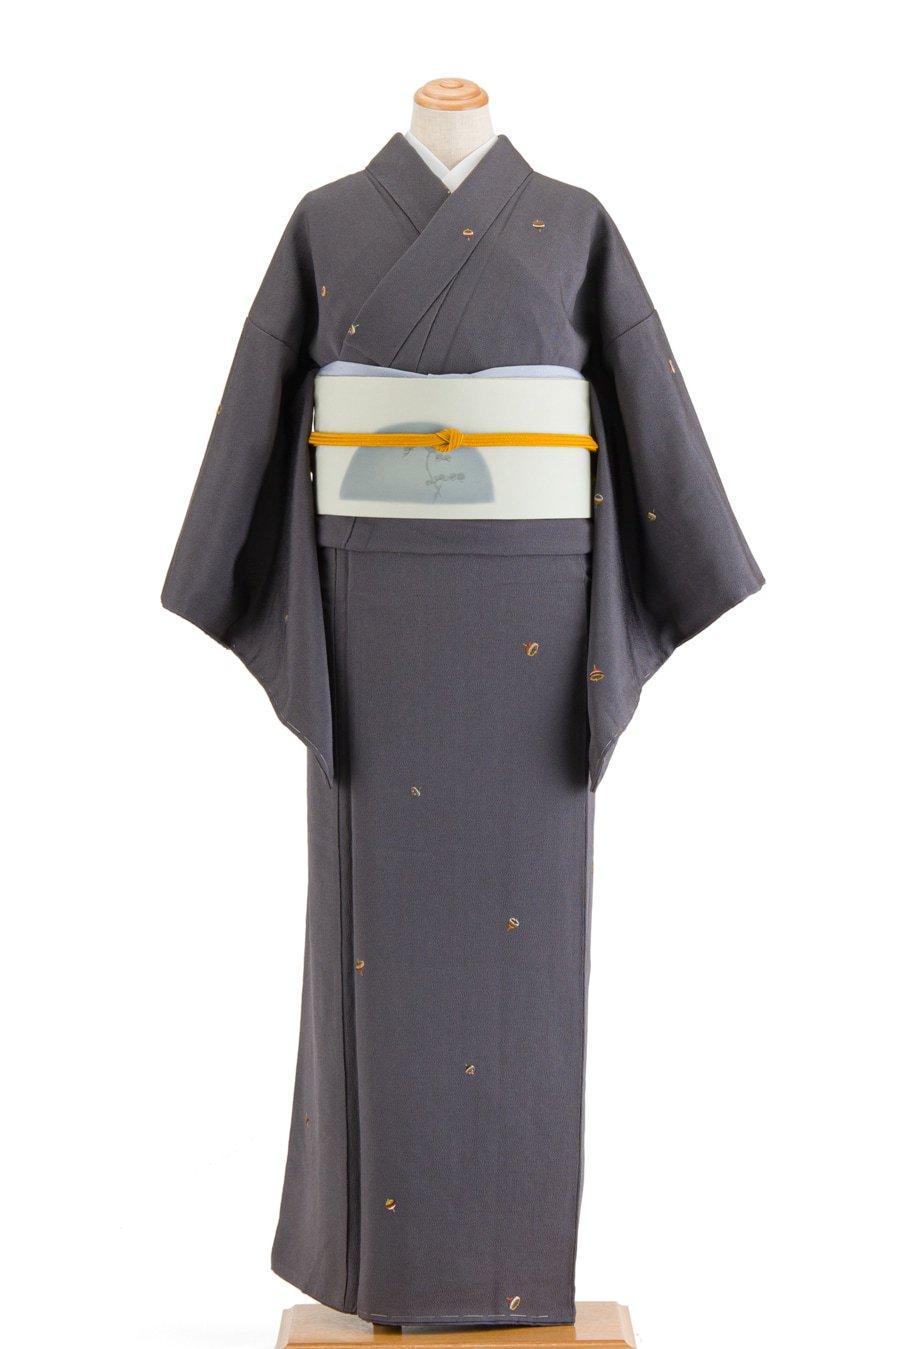 「蘇州刺繍 独楽 飛び柄小紋」の商品画像